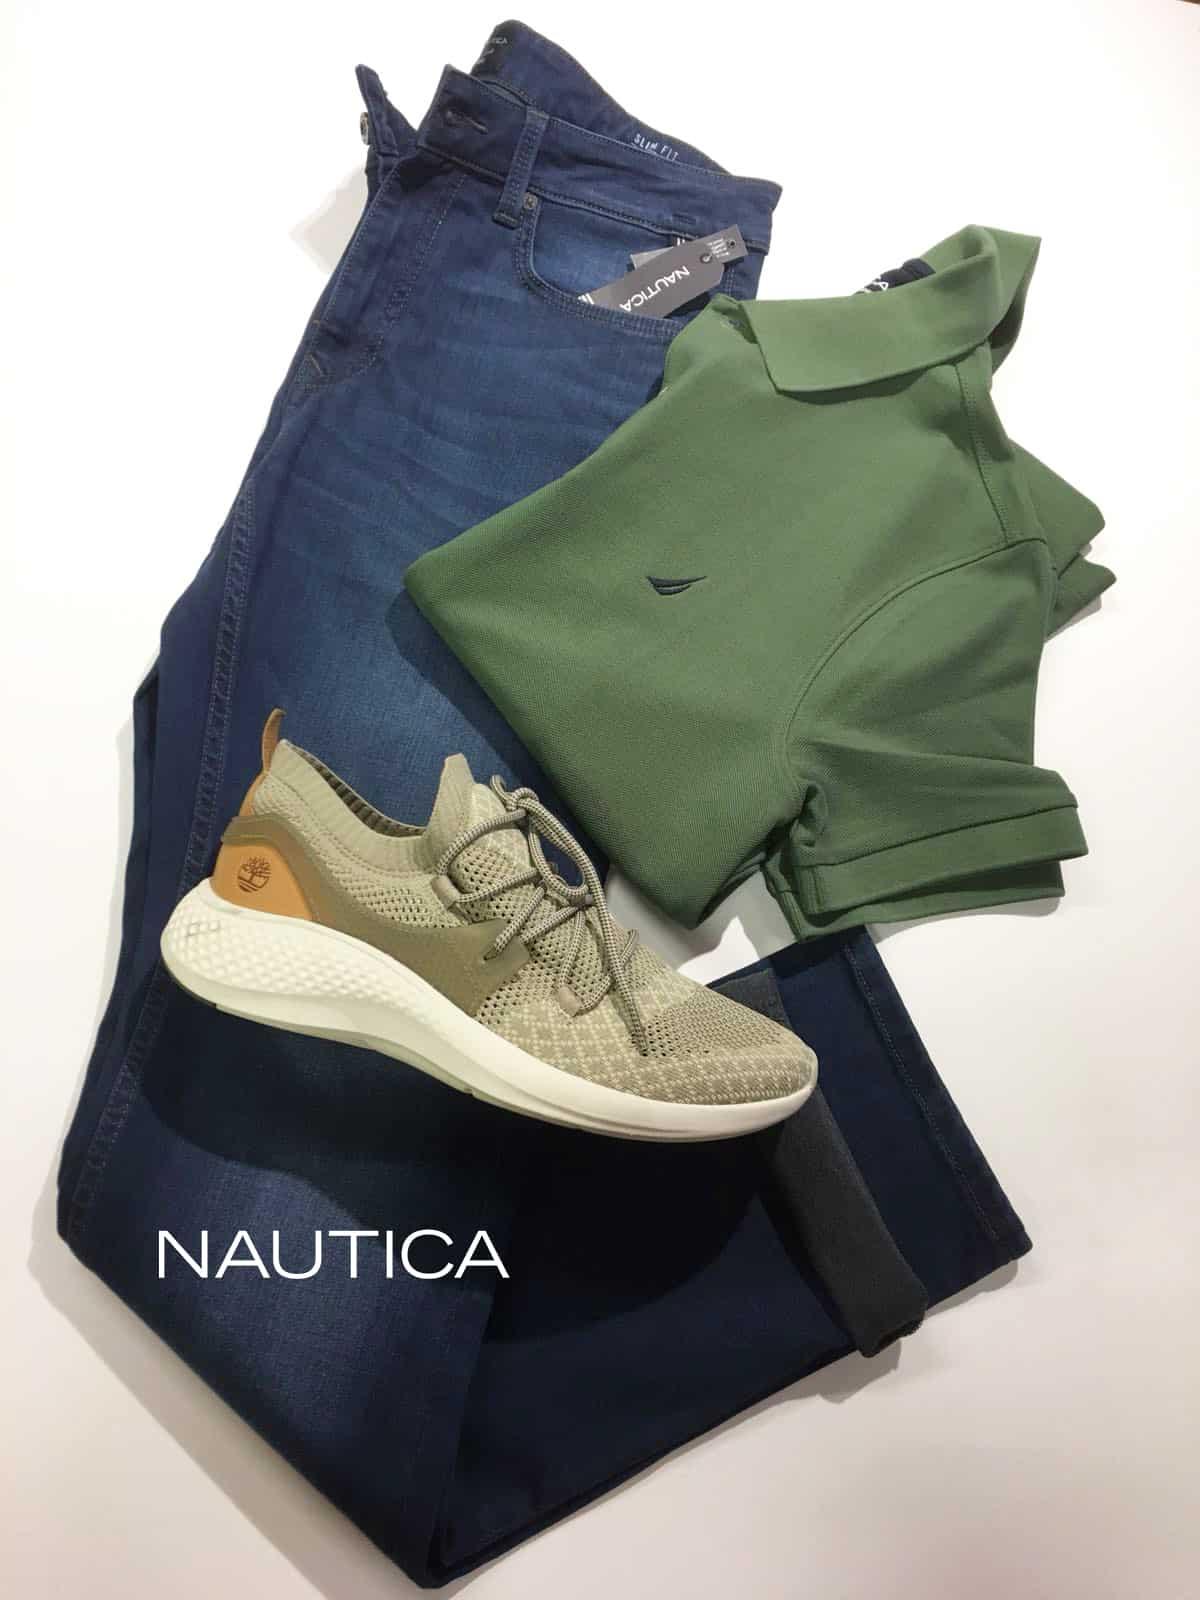 15pic_nautica_1.3